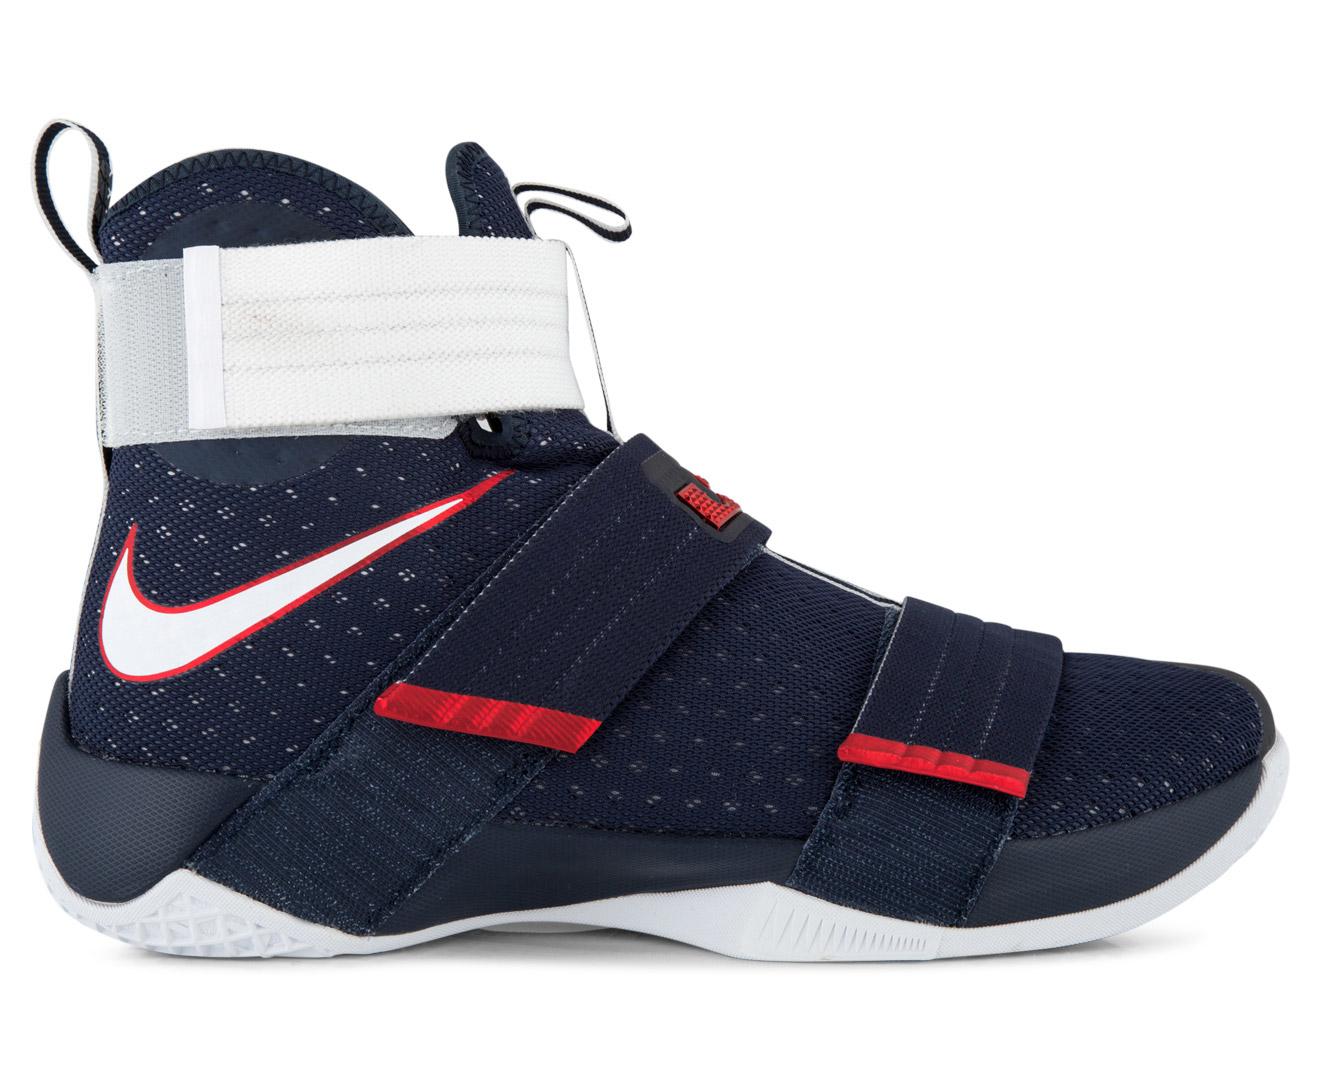 ad0585b661d2 Nike Men s LeBron Soldier 10 SFG Basketball Shoe -  Obsidian White University Red